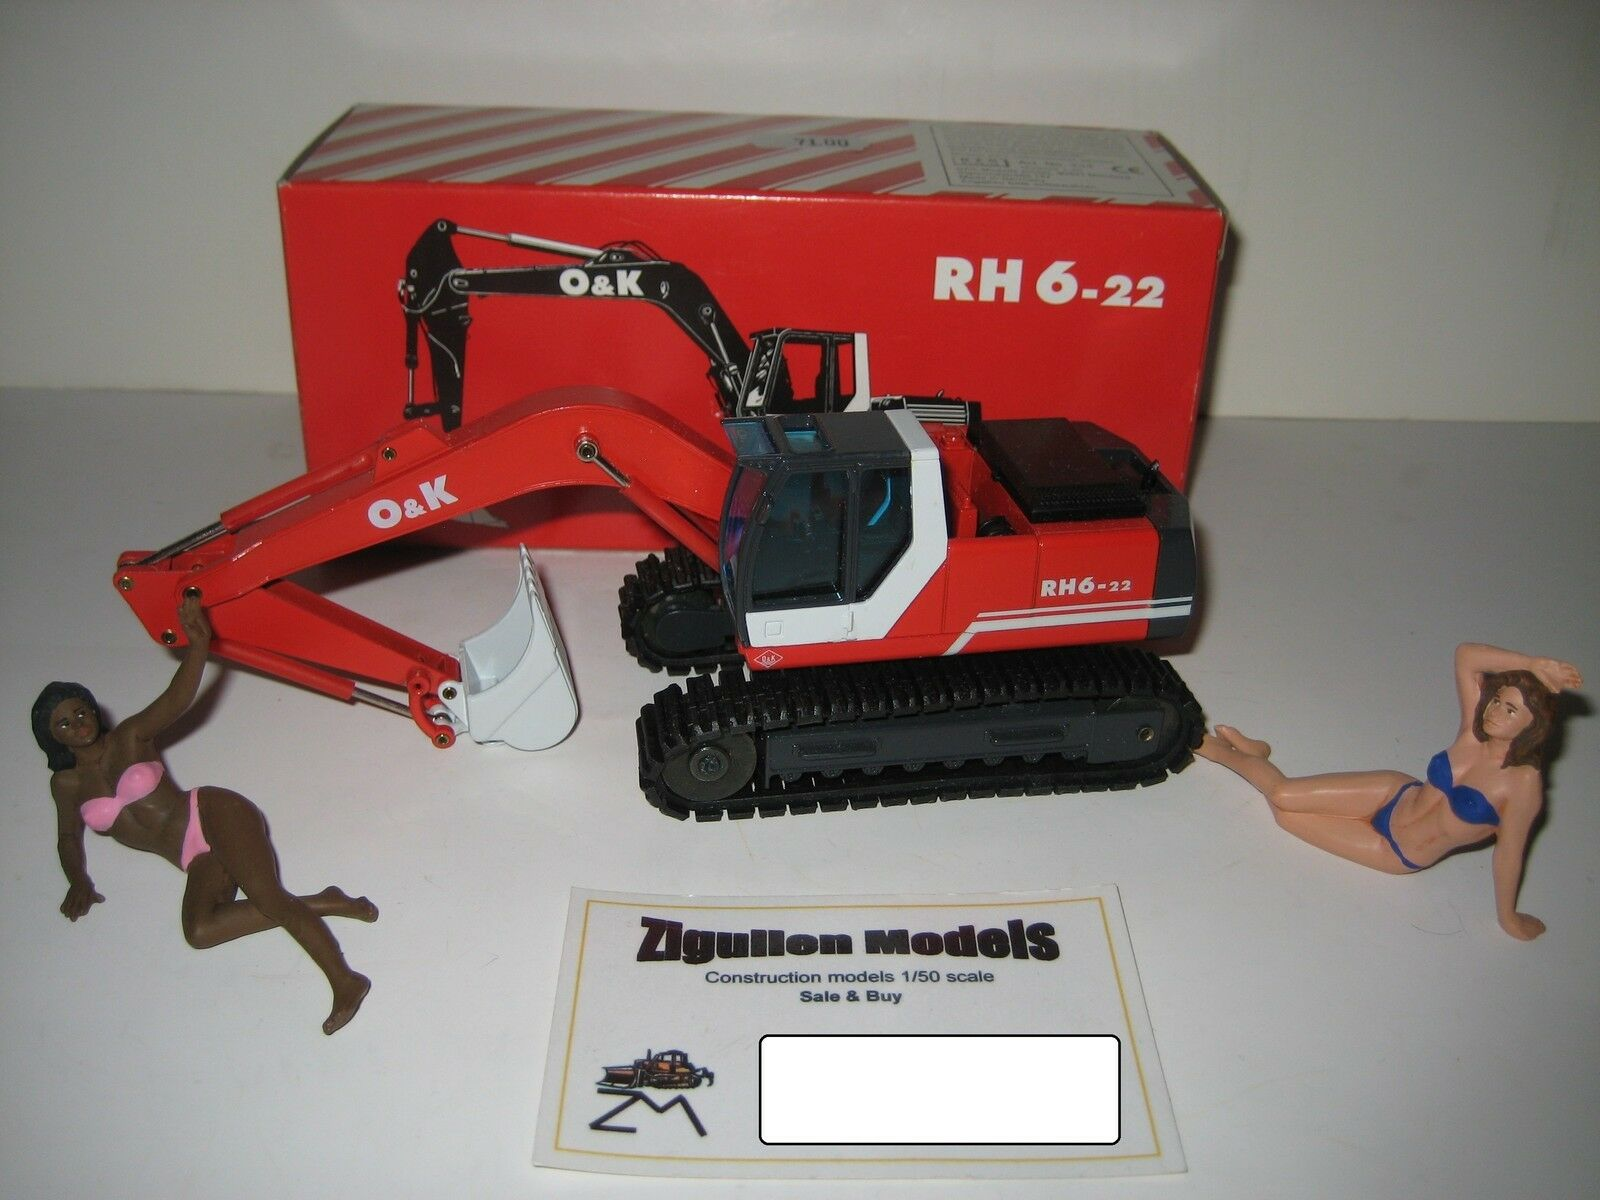 O&k RH 6-22 Excavateurs tieflöffel vers à soie  334.5 NZG 1 50 neuf dans sa boîte